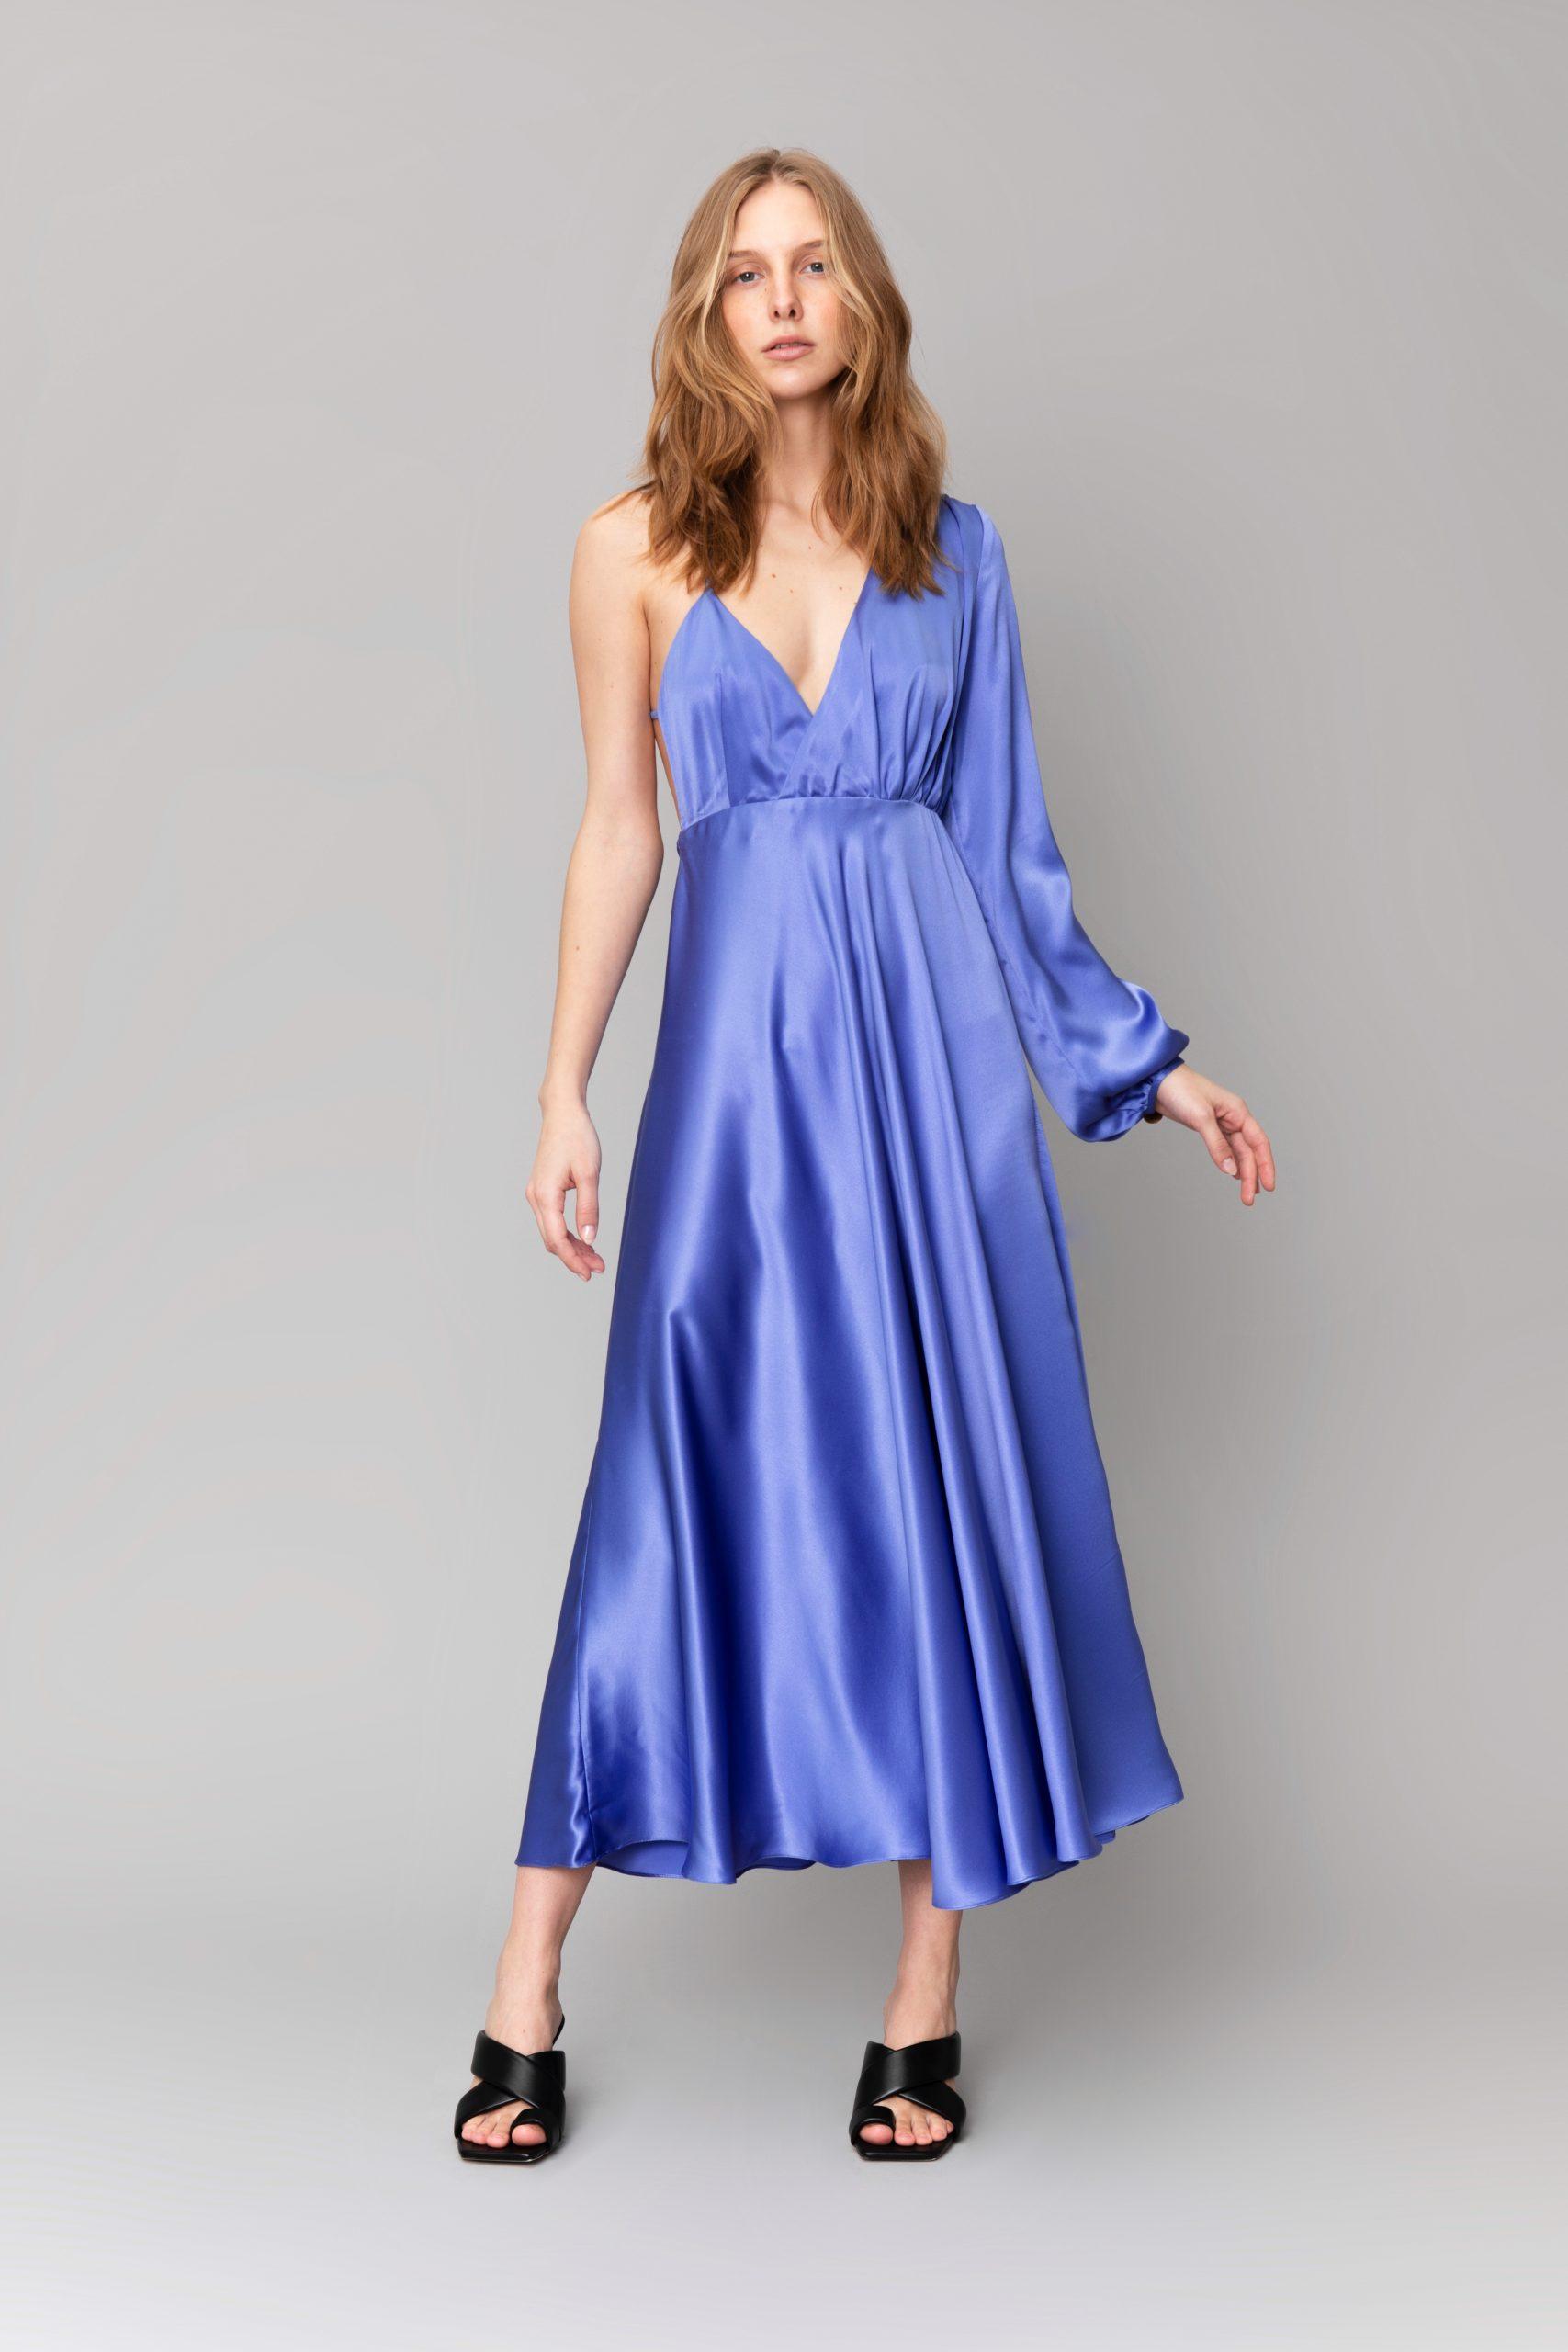 one-sleeve-dress-bajore-1